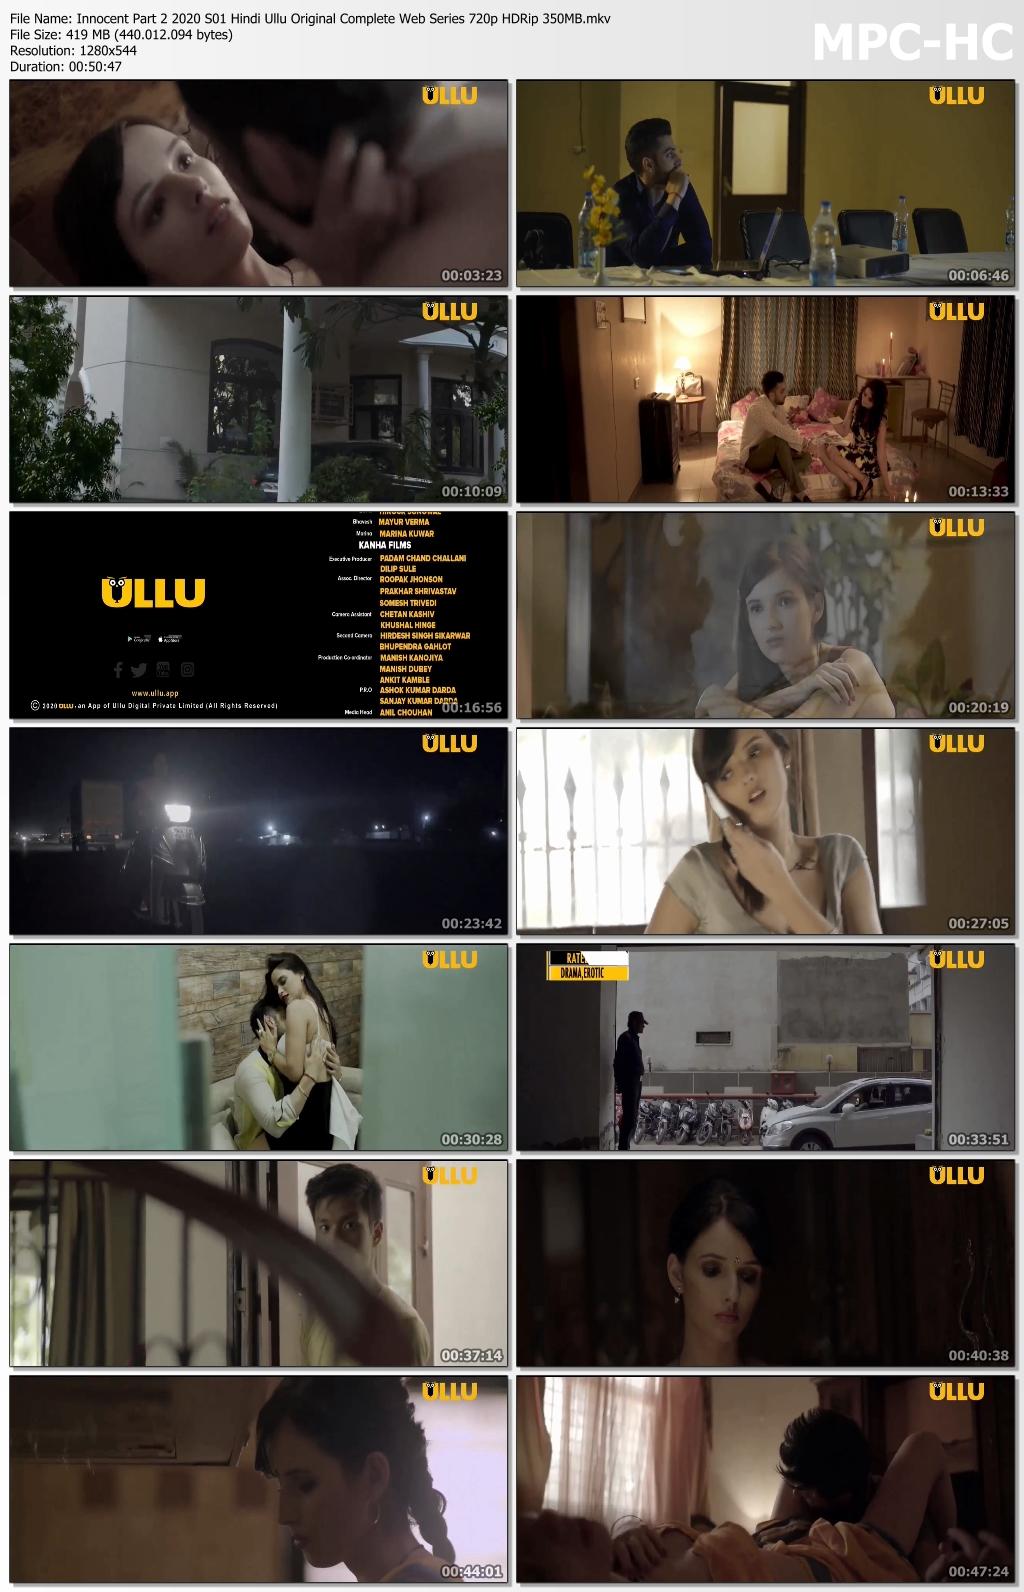 Innocent-Part-2-2020-S01-Hindi-Ullu-Original-Complete-Web-Series-720p-HDRip-350-MB-mkv-thumbs